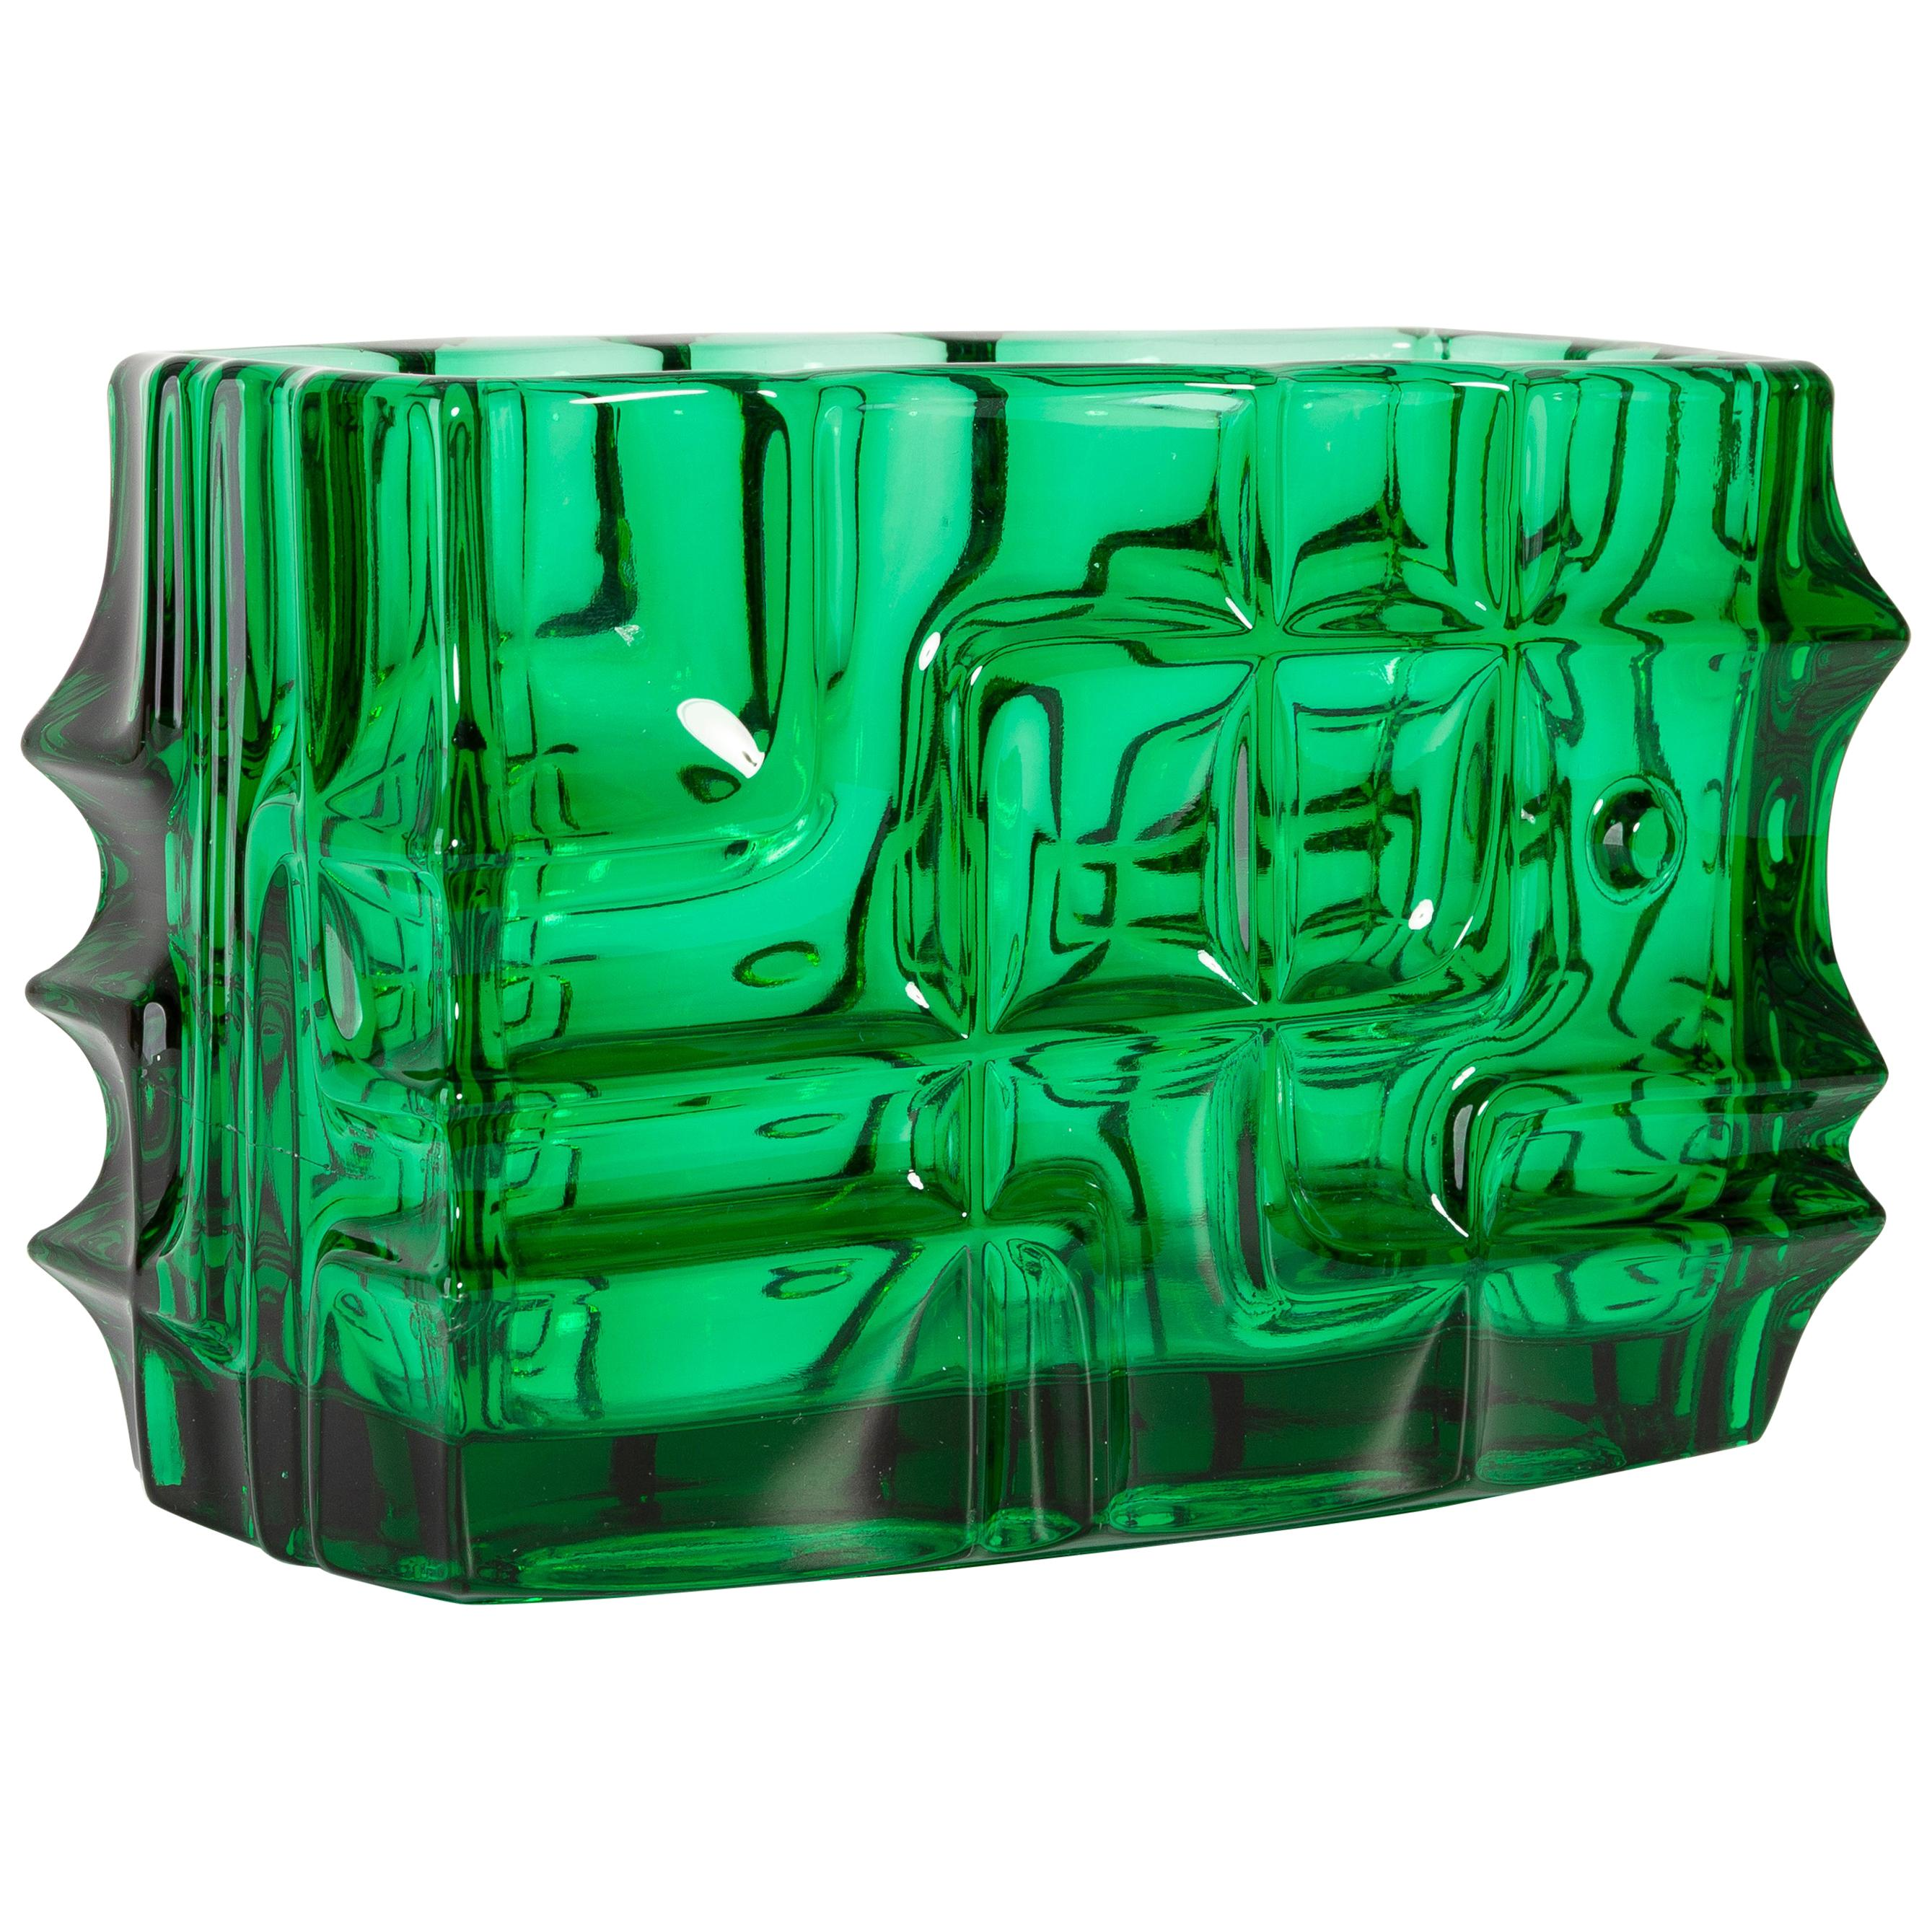 Emerald Green Vase by Vladislav Urban for Sklo Union, 20th Century, Europe 1960s